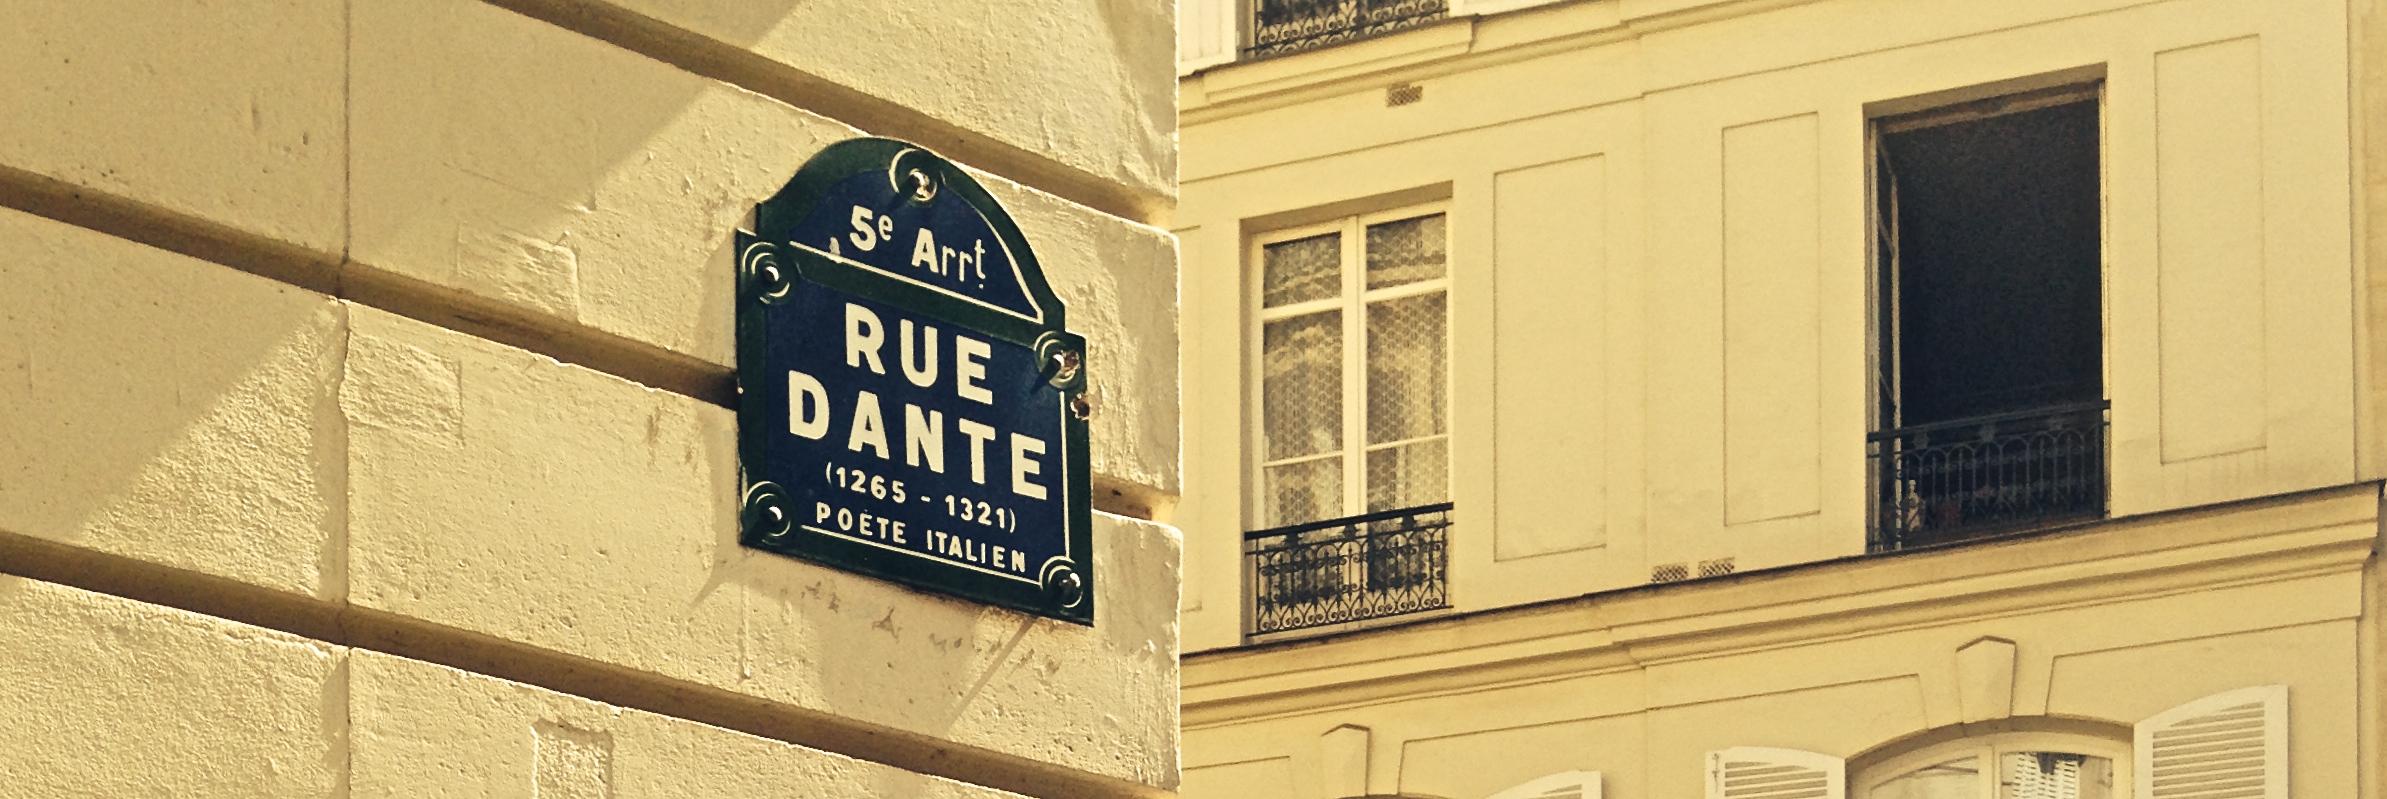 Rue Dante Sign